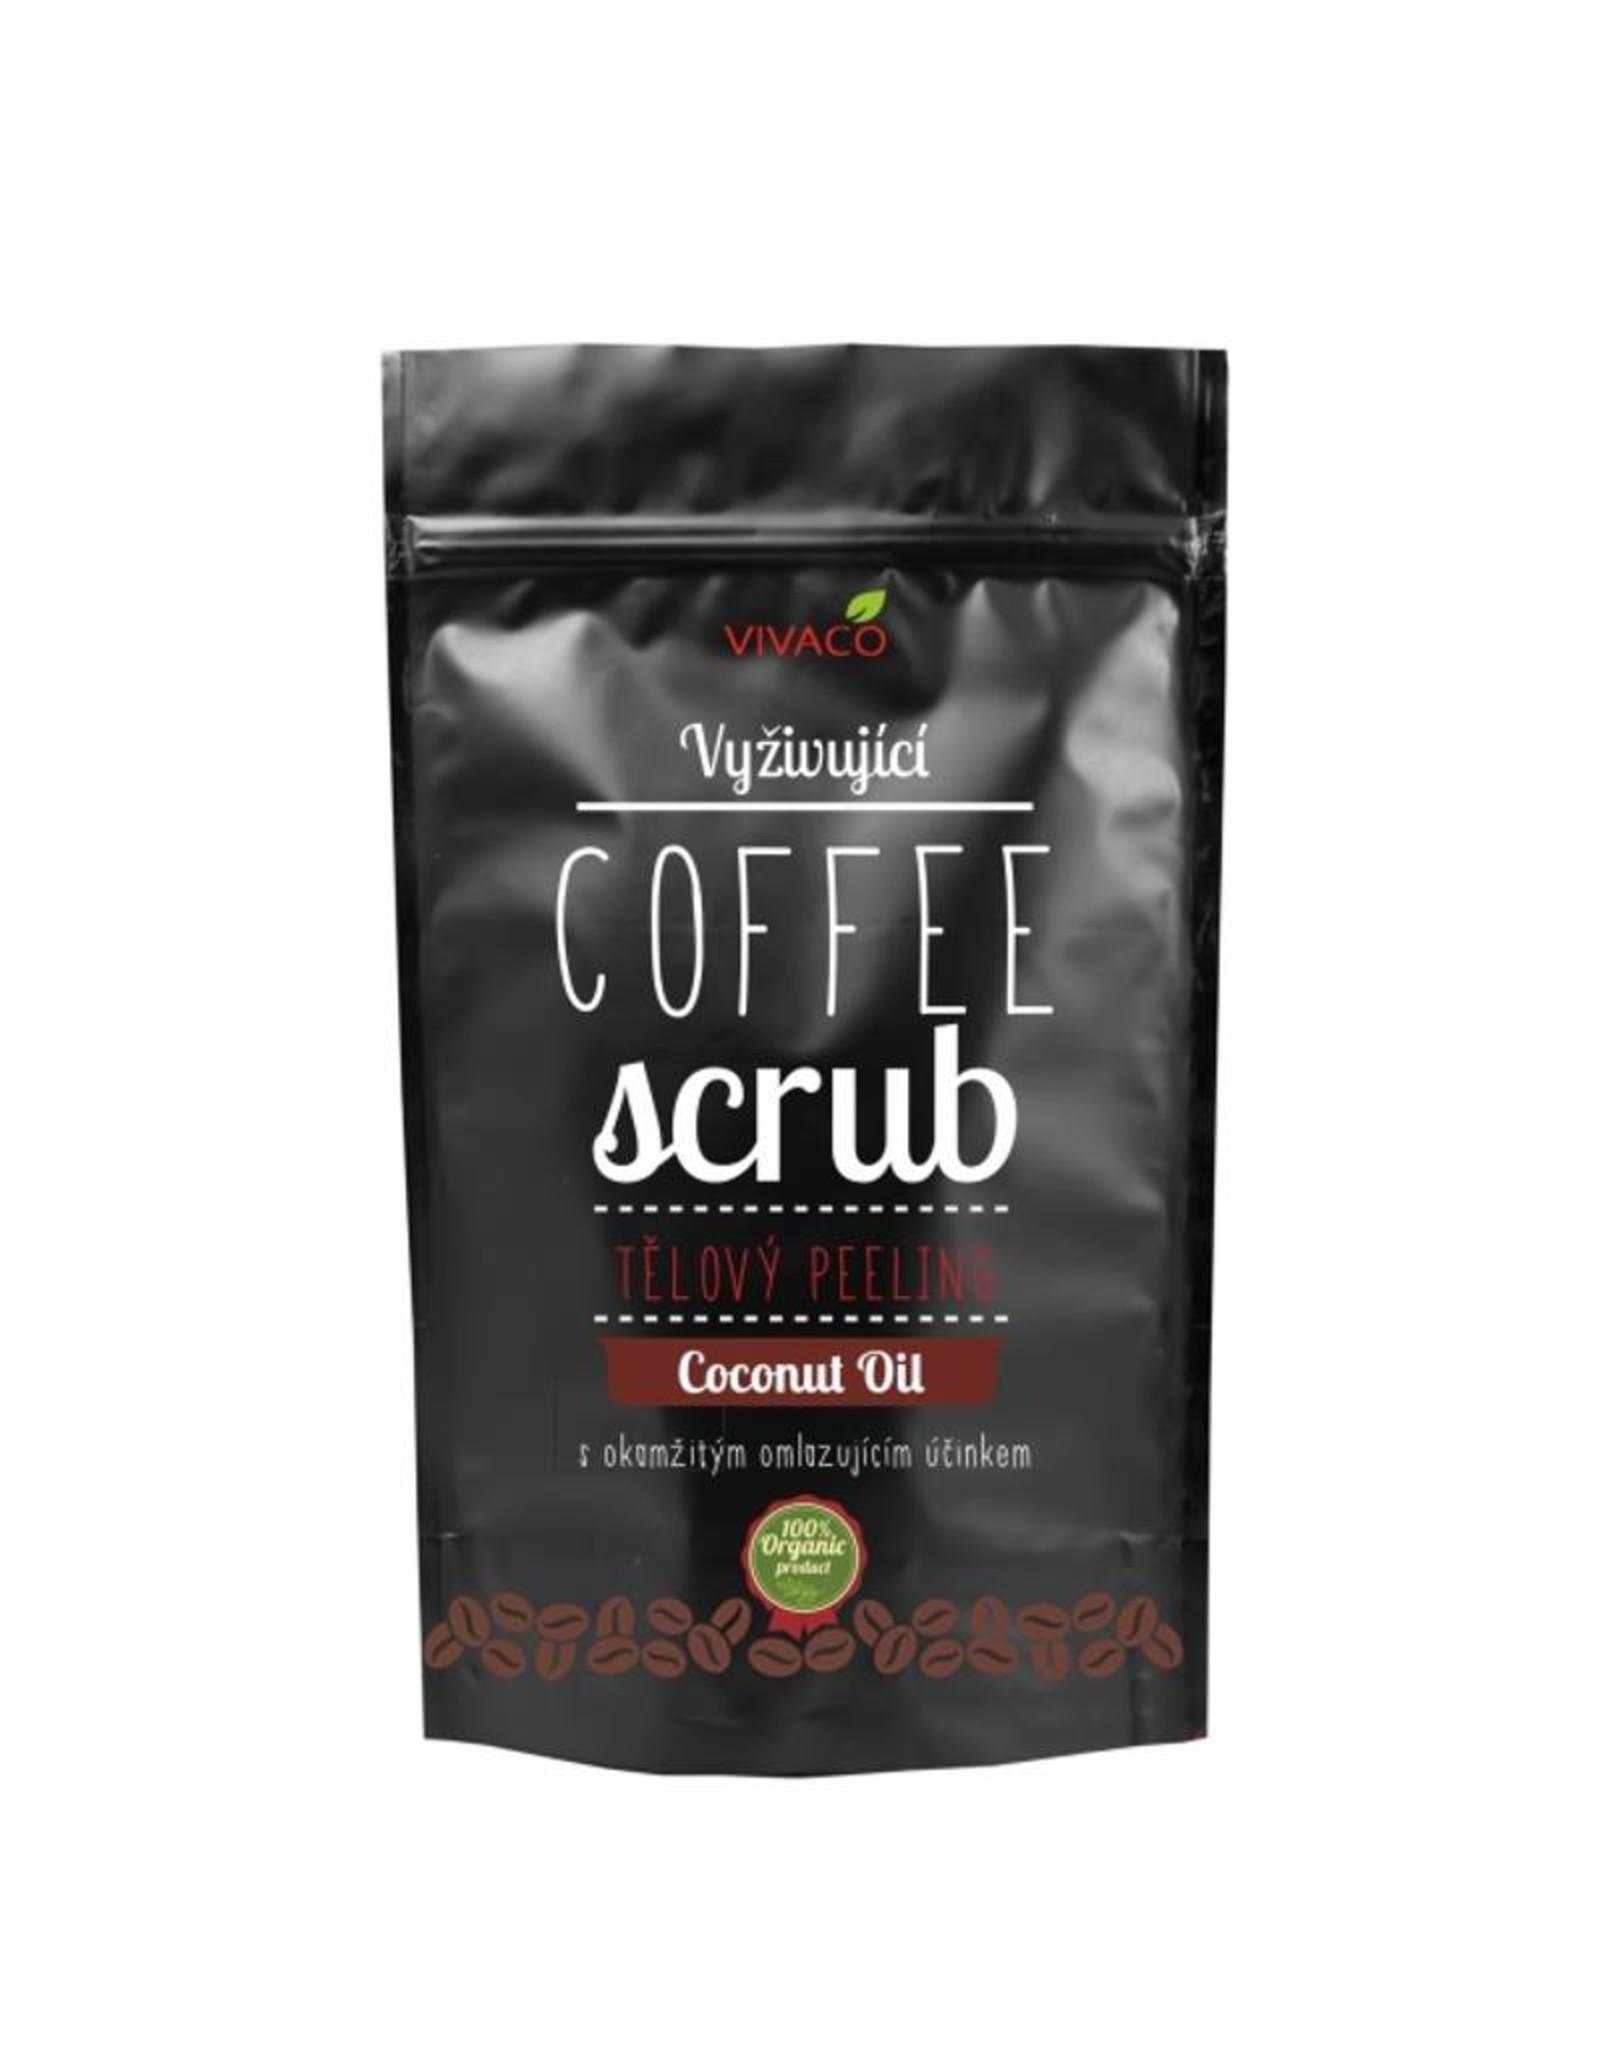 VIVACO Coffee Scrub Body Peeling met Kokosolie (100% organisch)